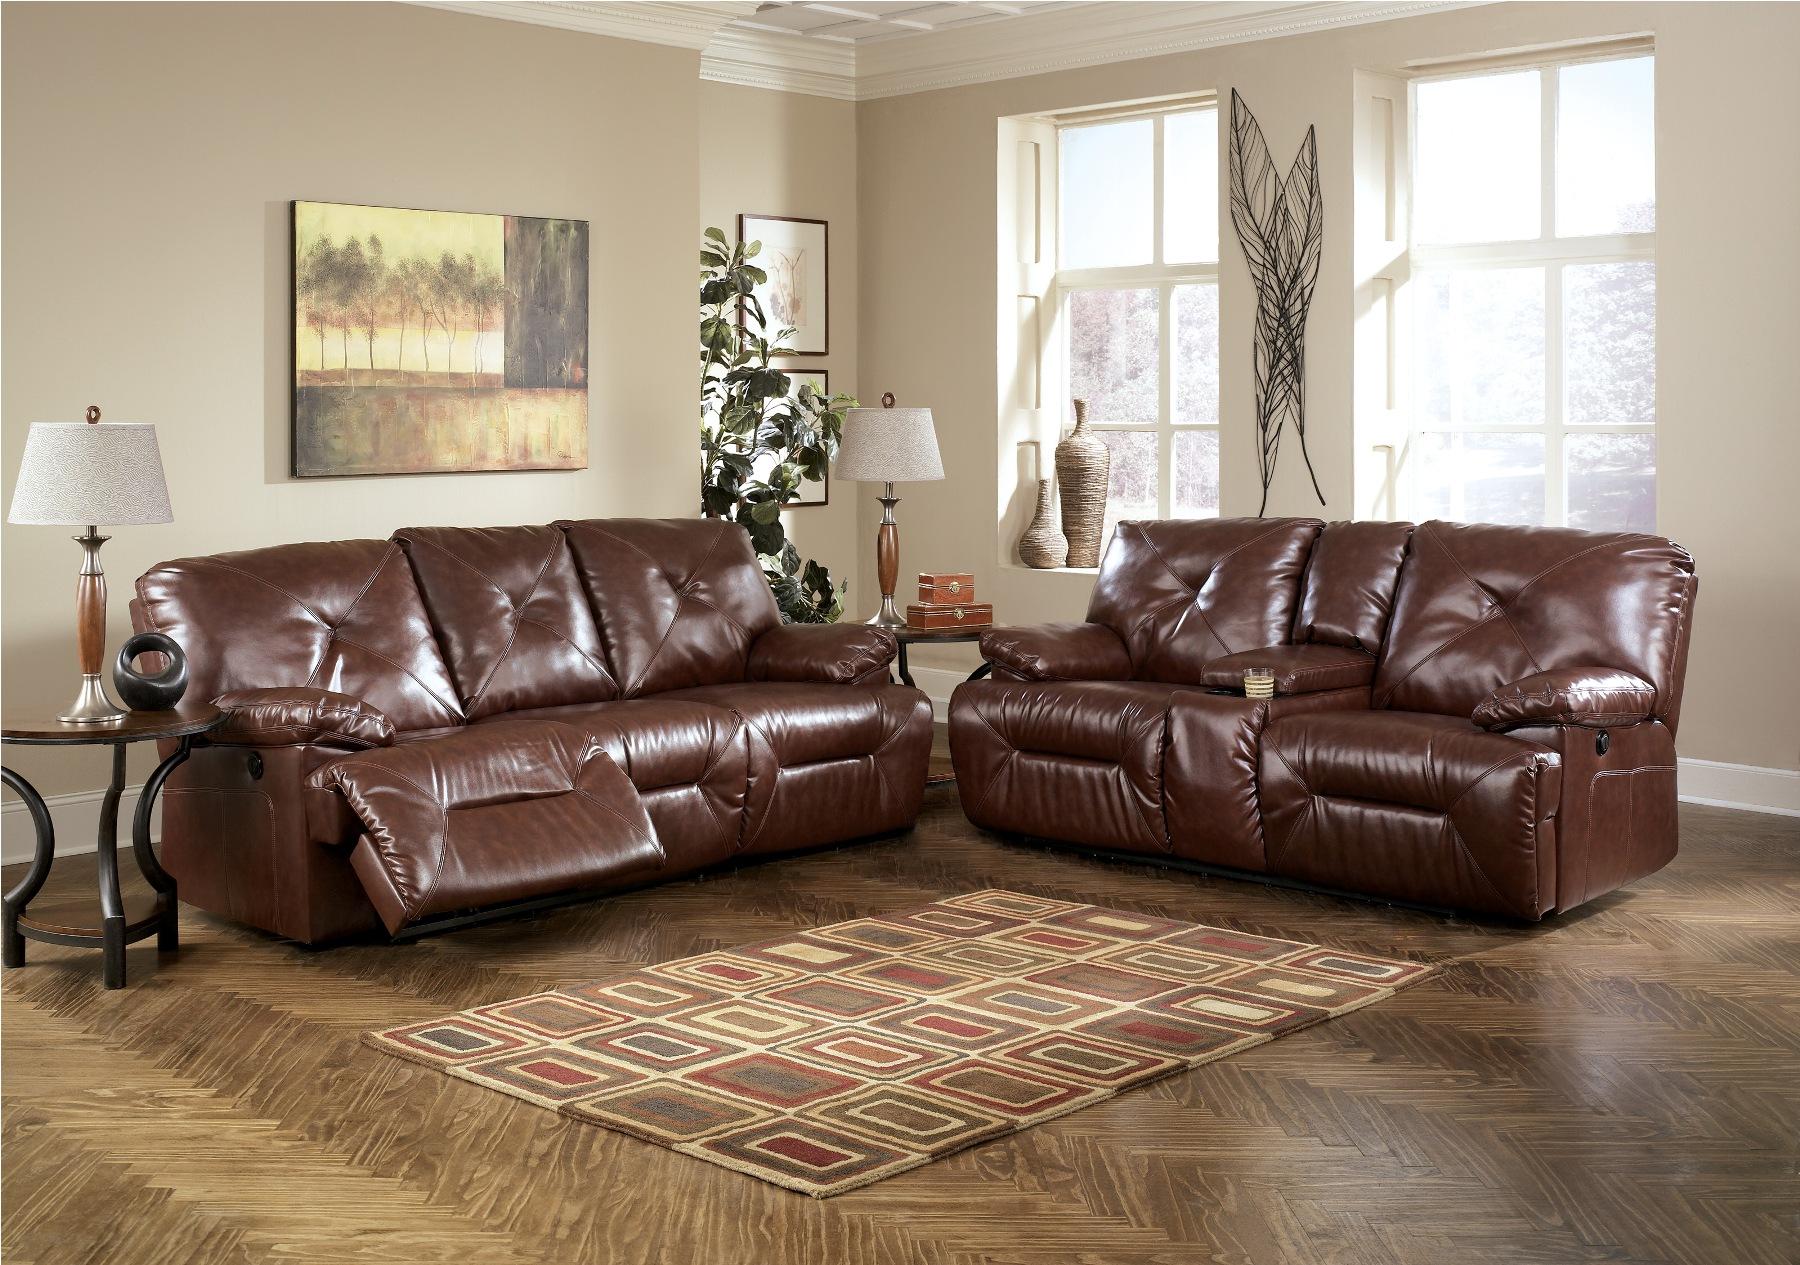 Furniture > Living Room Furniture > Pad > Option Pad